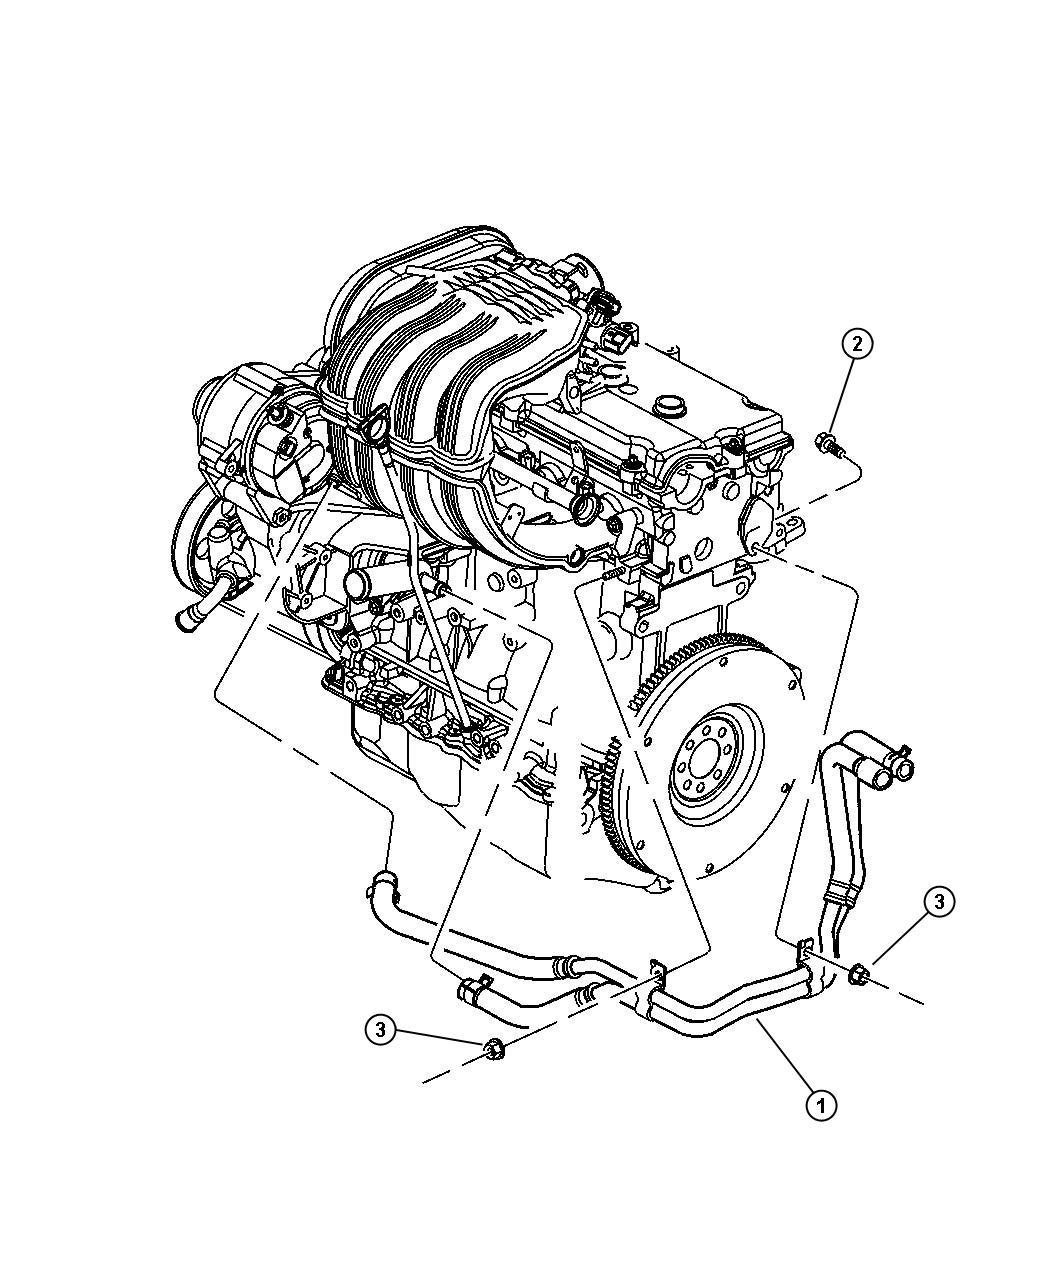 2003 Jeep Liberty Plumbing, Heater 2.4L Engine, LHD.